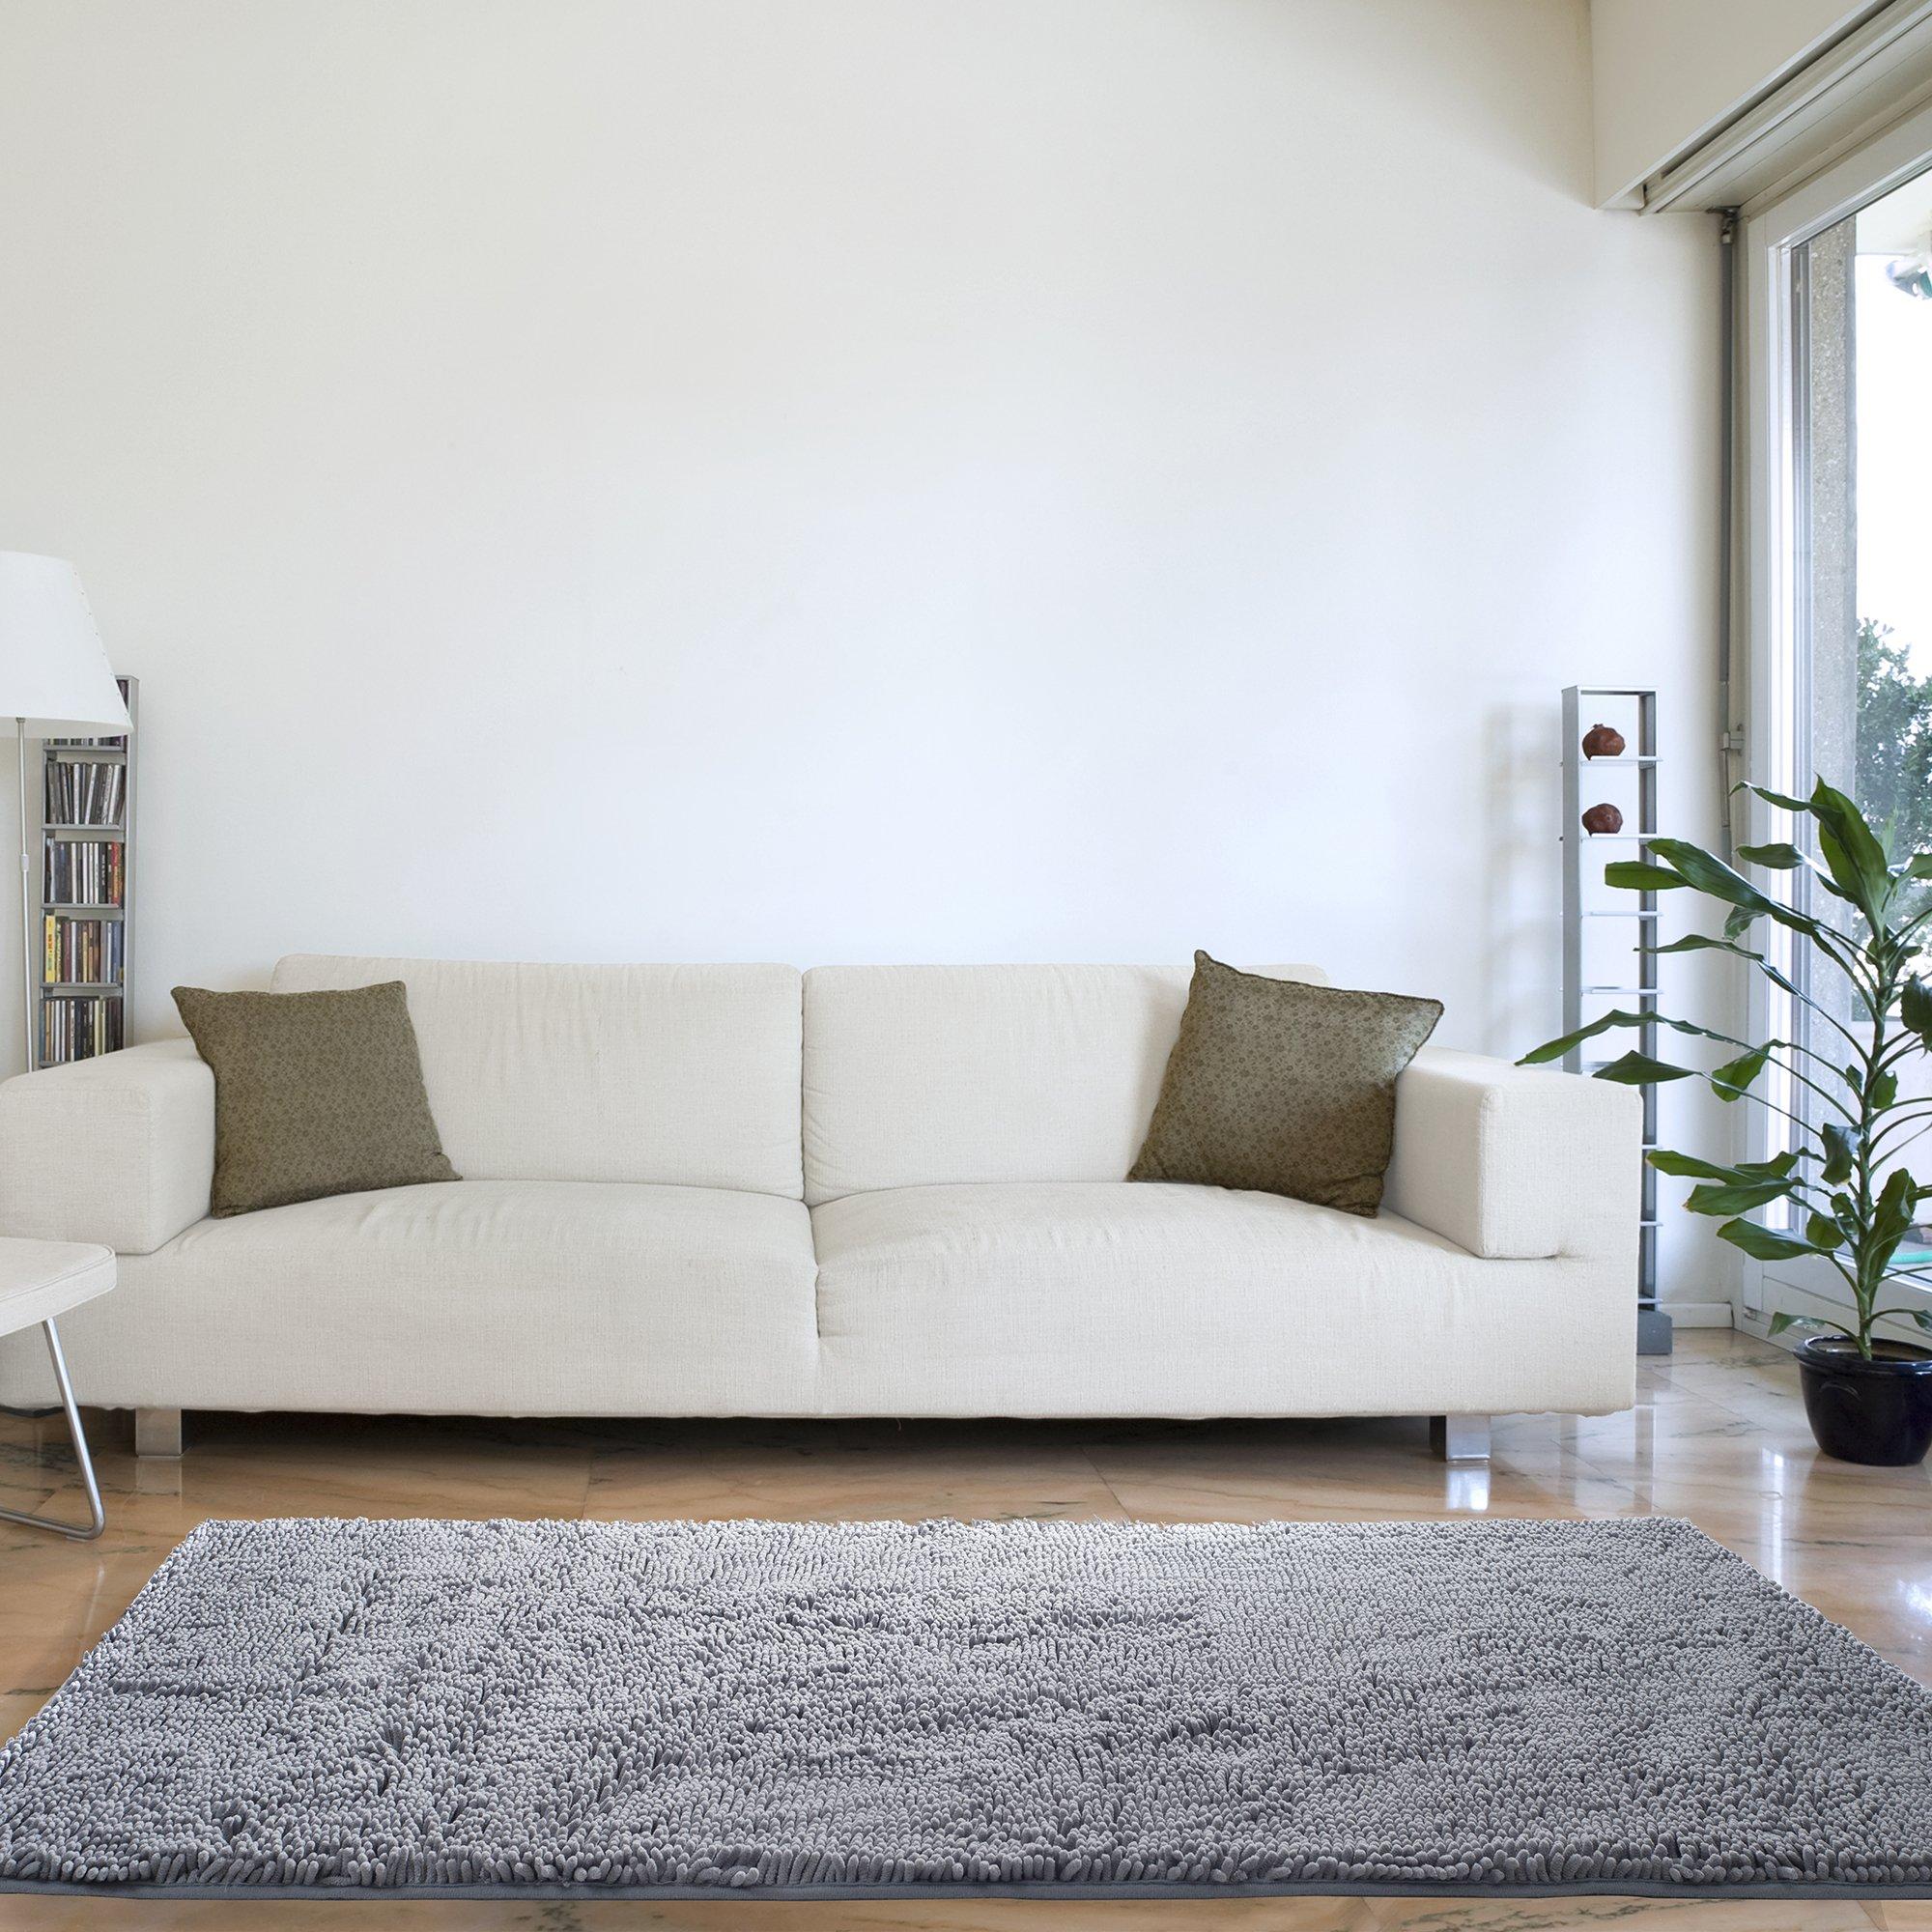 Bedford Home High Pile Shag Rug Carpet - Grey - 30x60